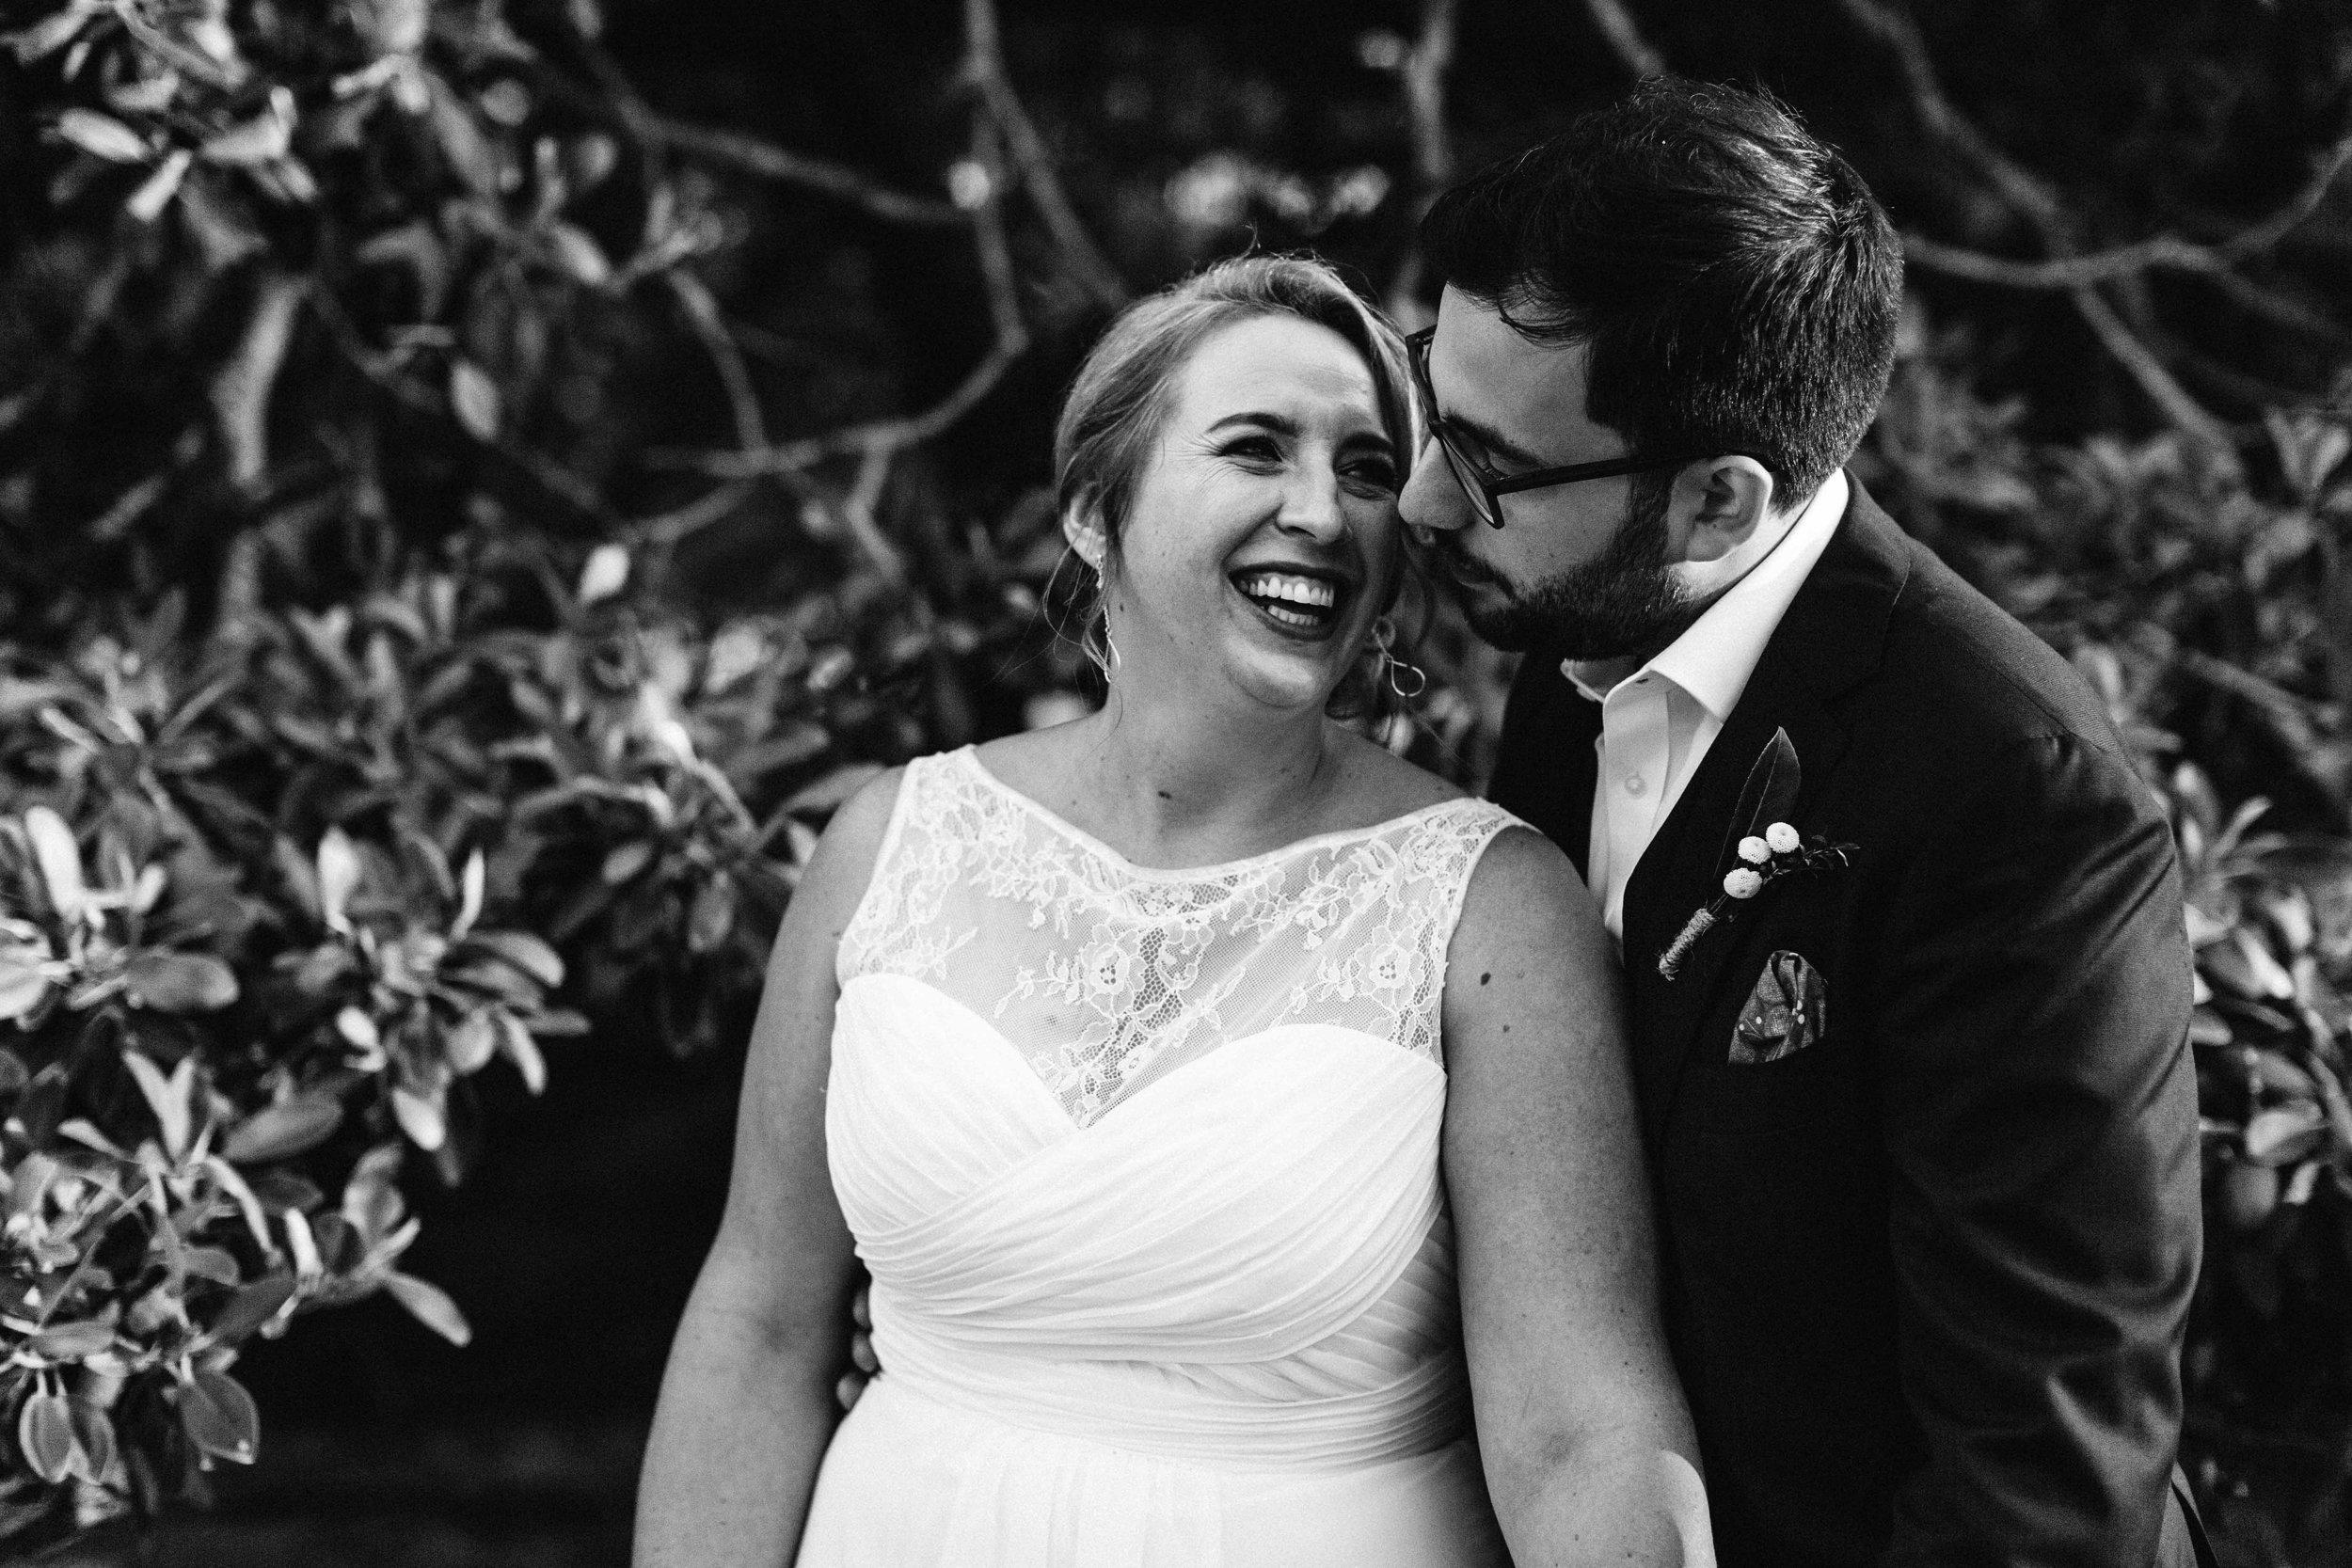 cabarita-park-sydney-wedding-emilyobrienphotography.net-57.jpg